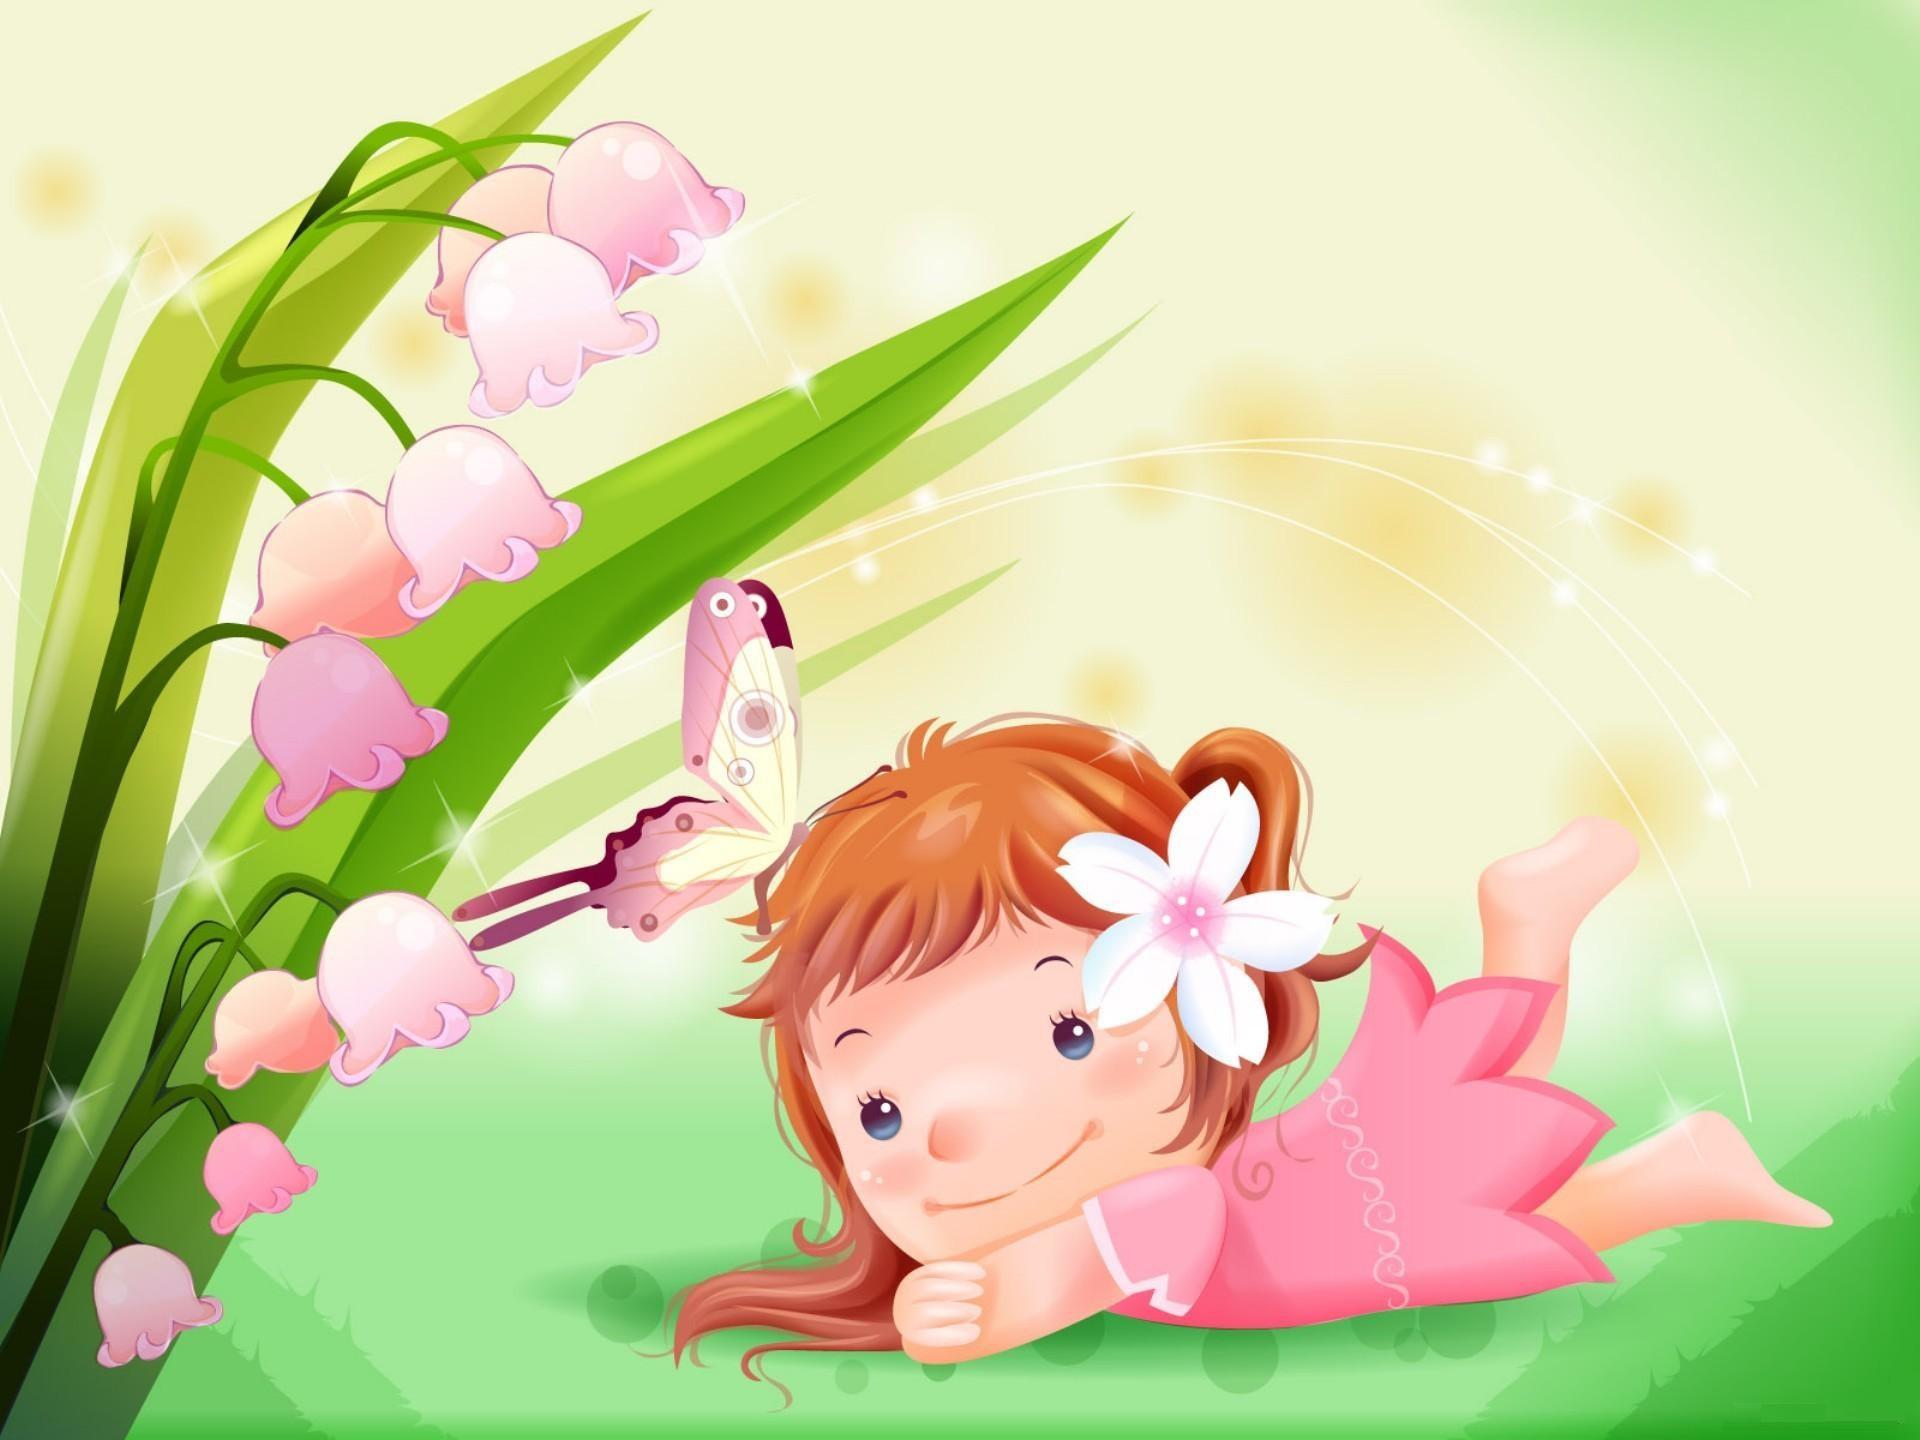 Res: 1920x1440, Cute Cartoon Girl with Flower HD Wallpaper Desktop Backgrounds Free